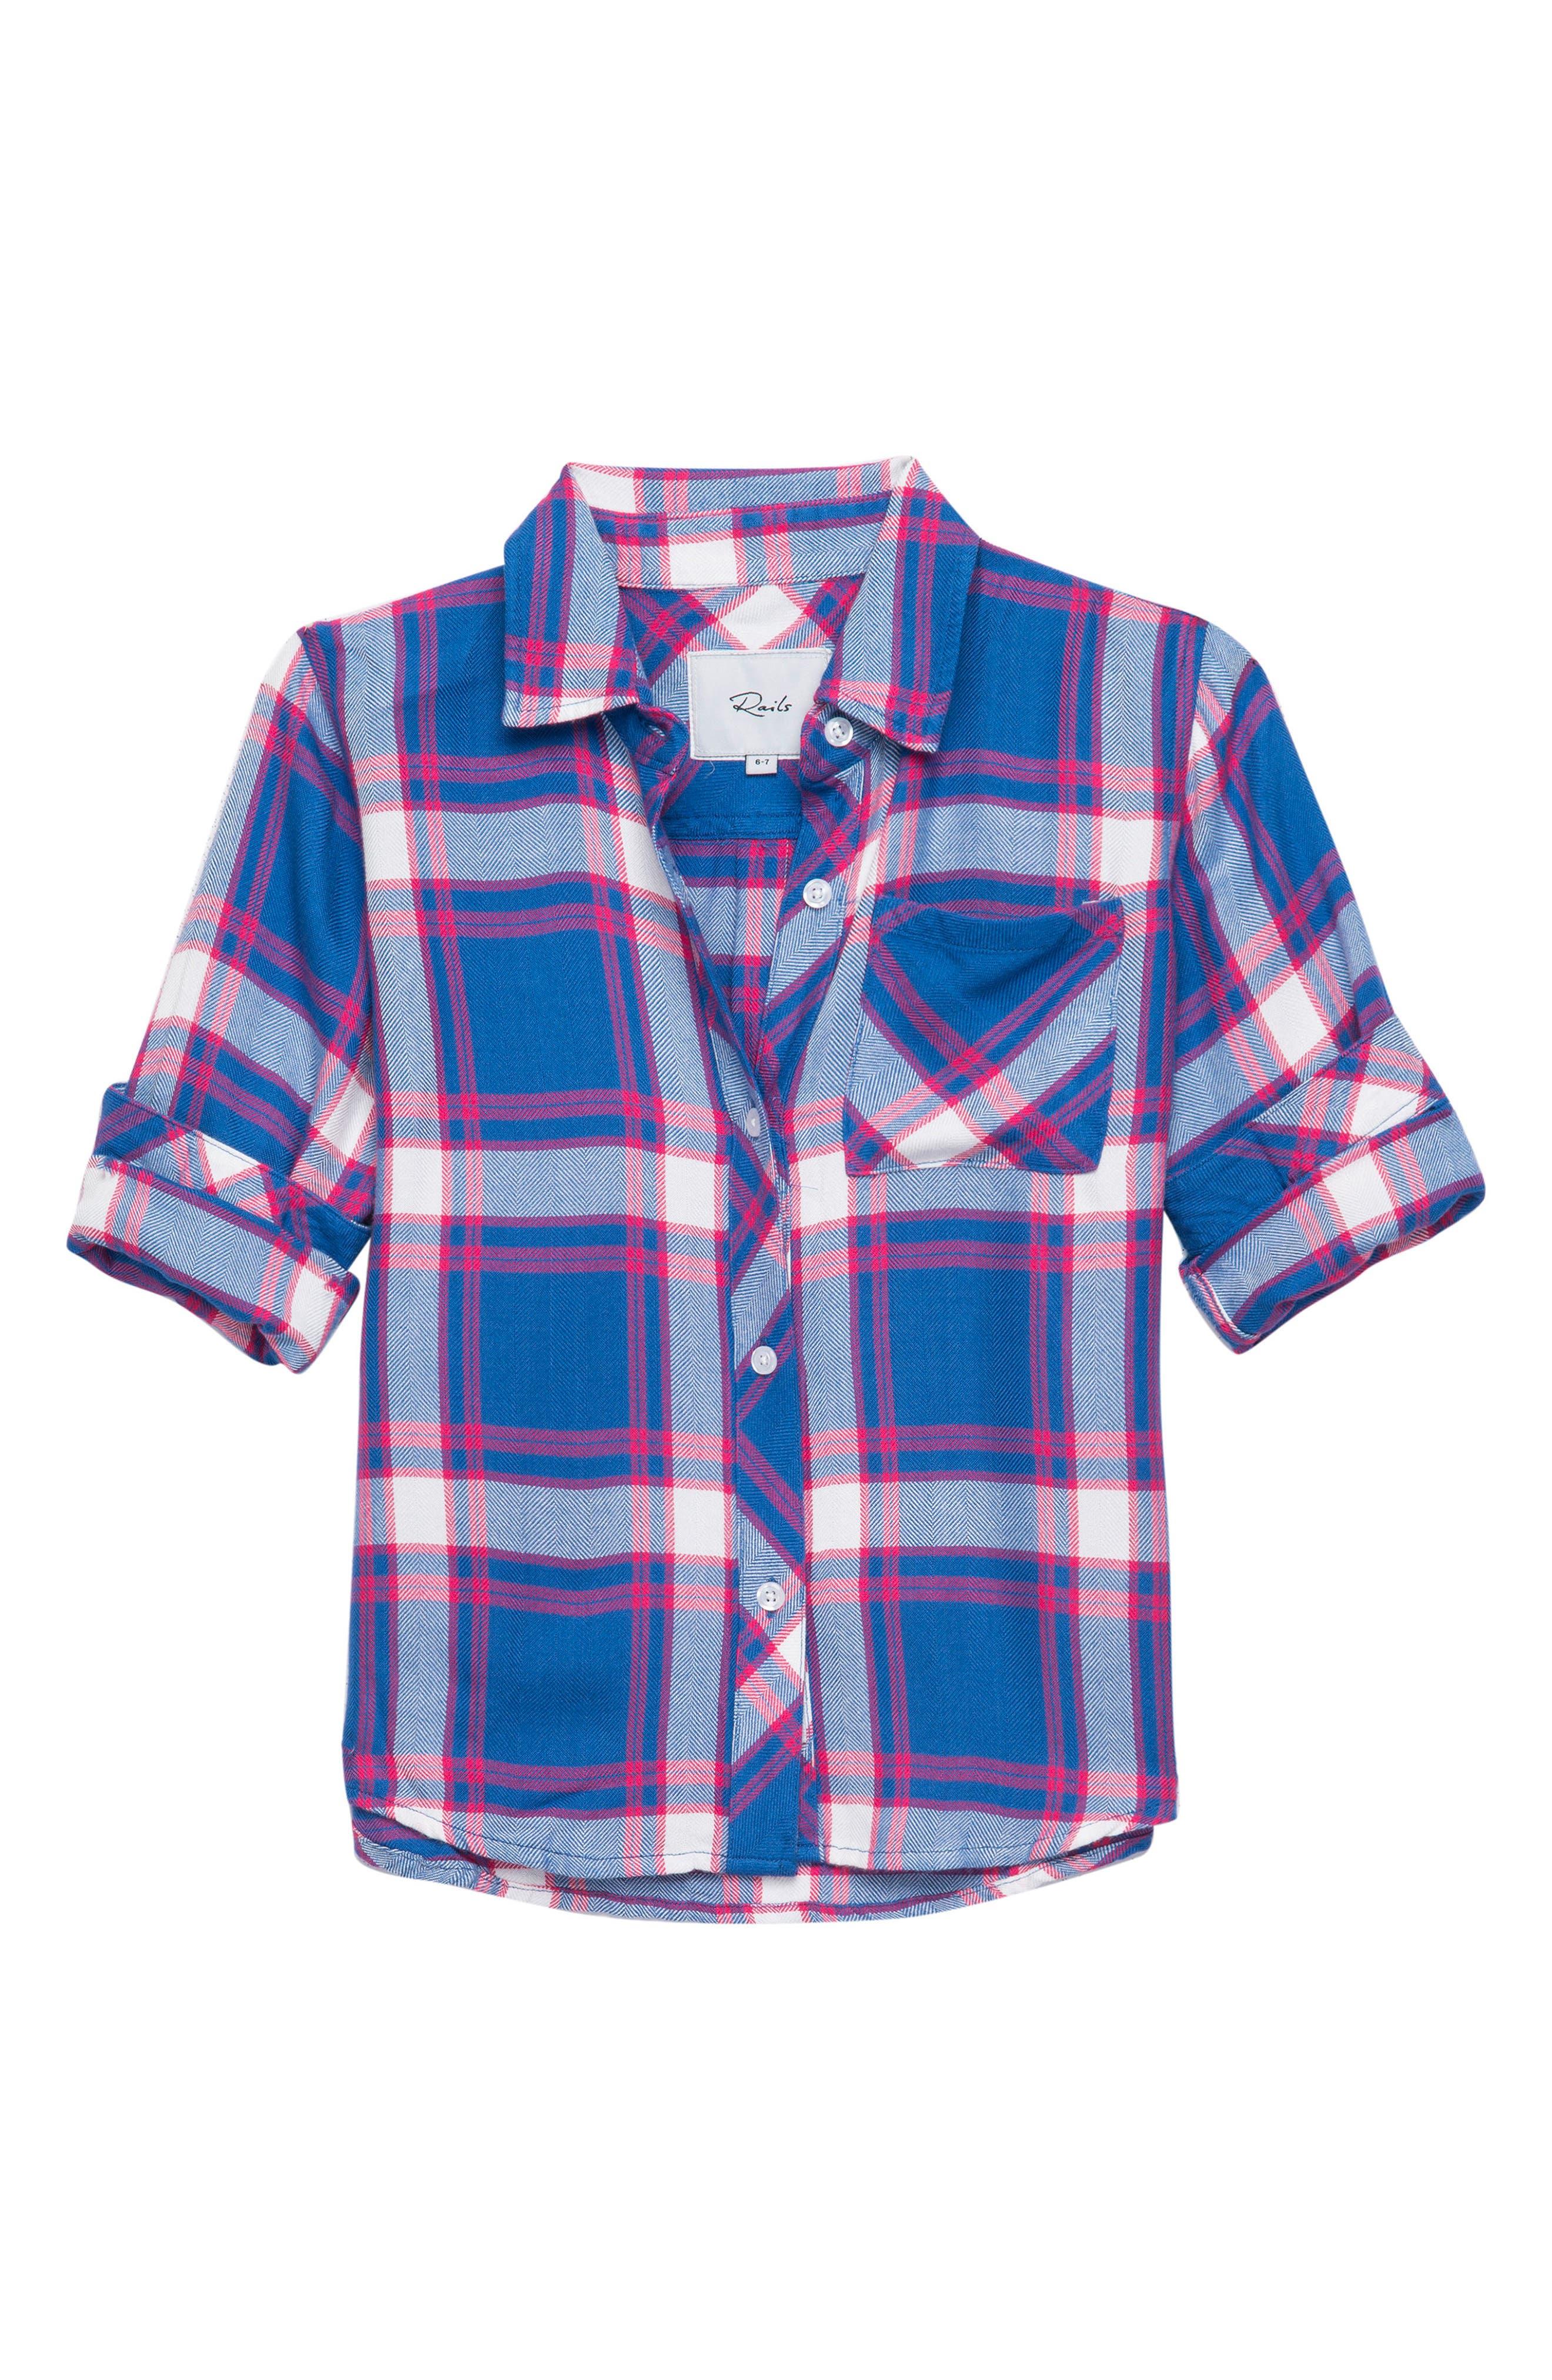 Hudson Plaid Shirt,                         Main,                         color, Ruby Sky White